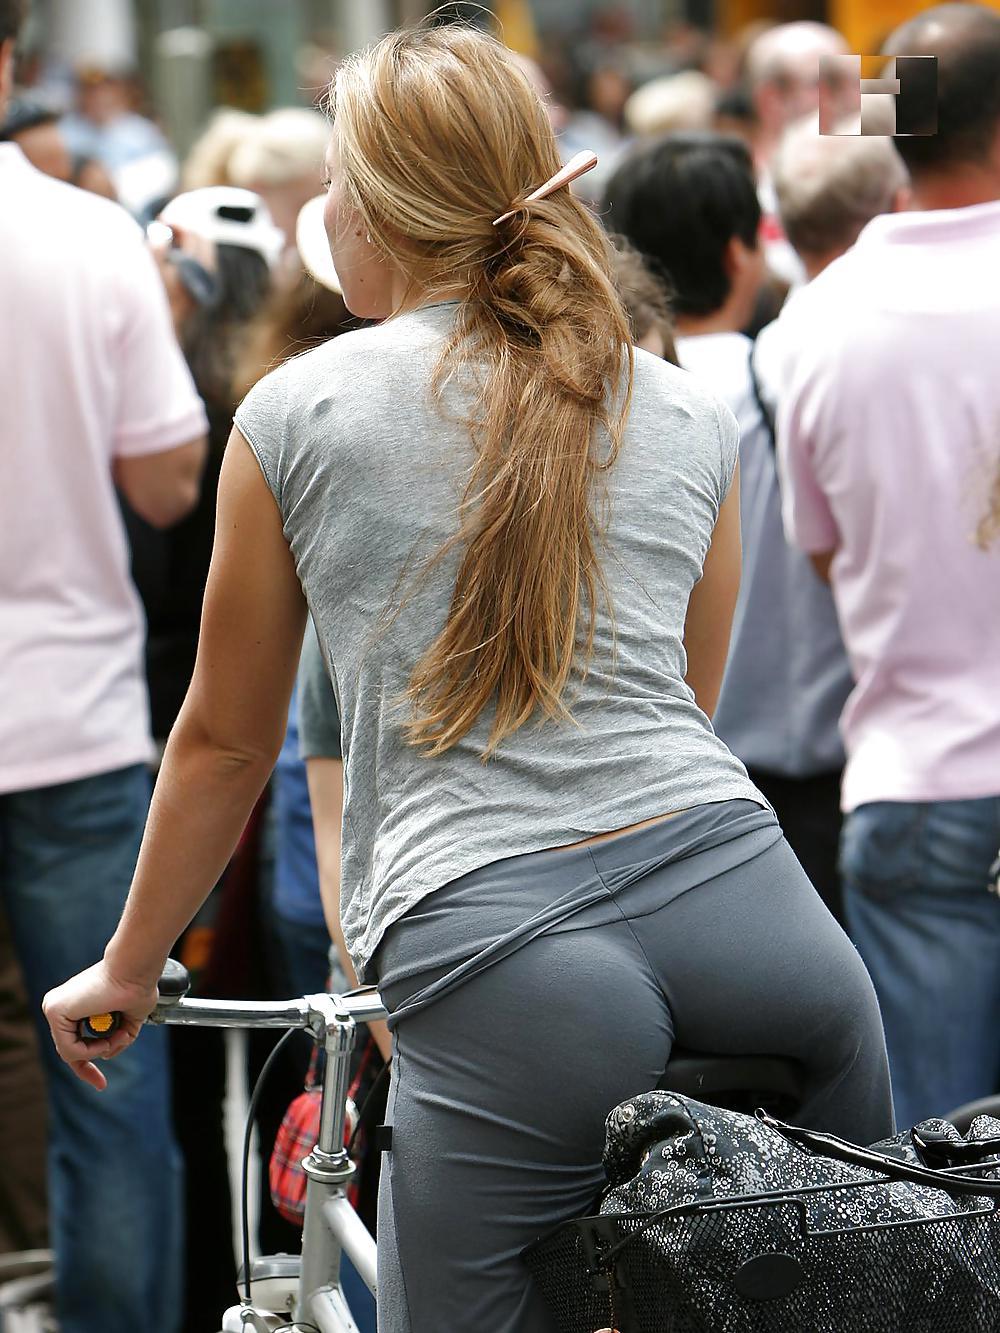 cumshot-free-tight-jeans-voyeur-pics-movie